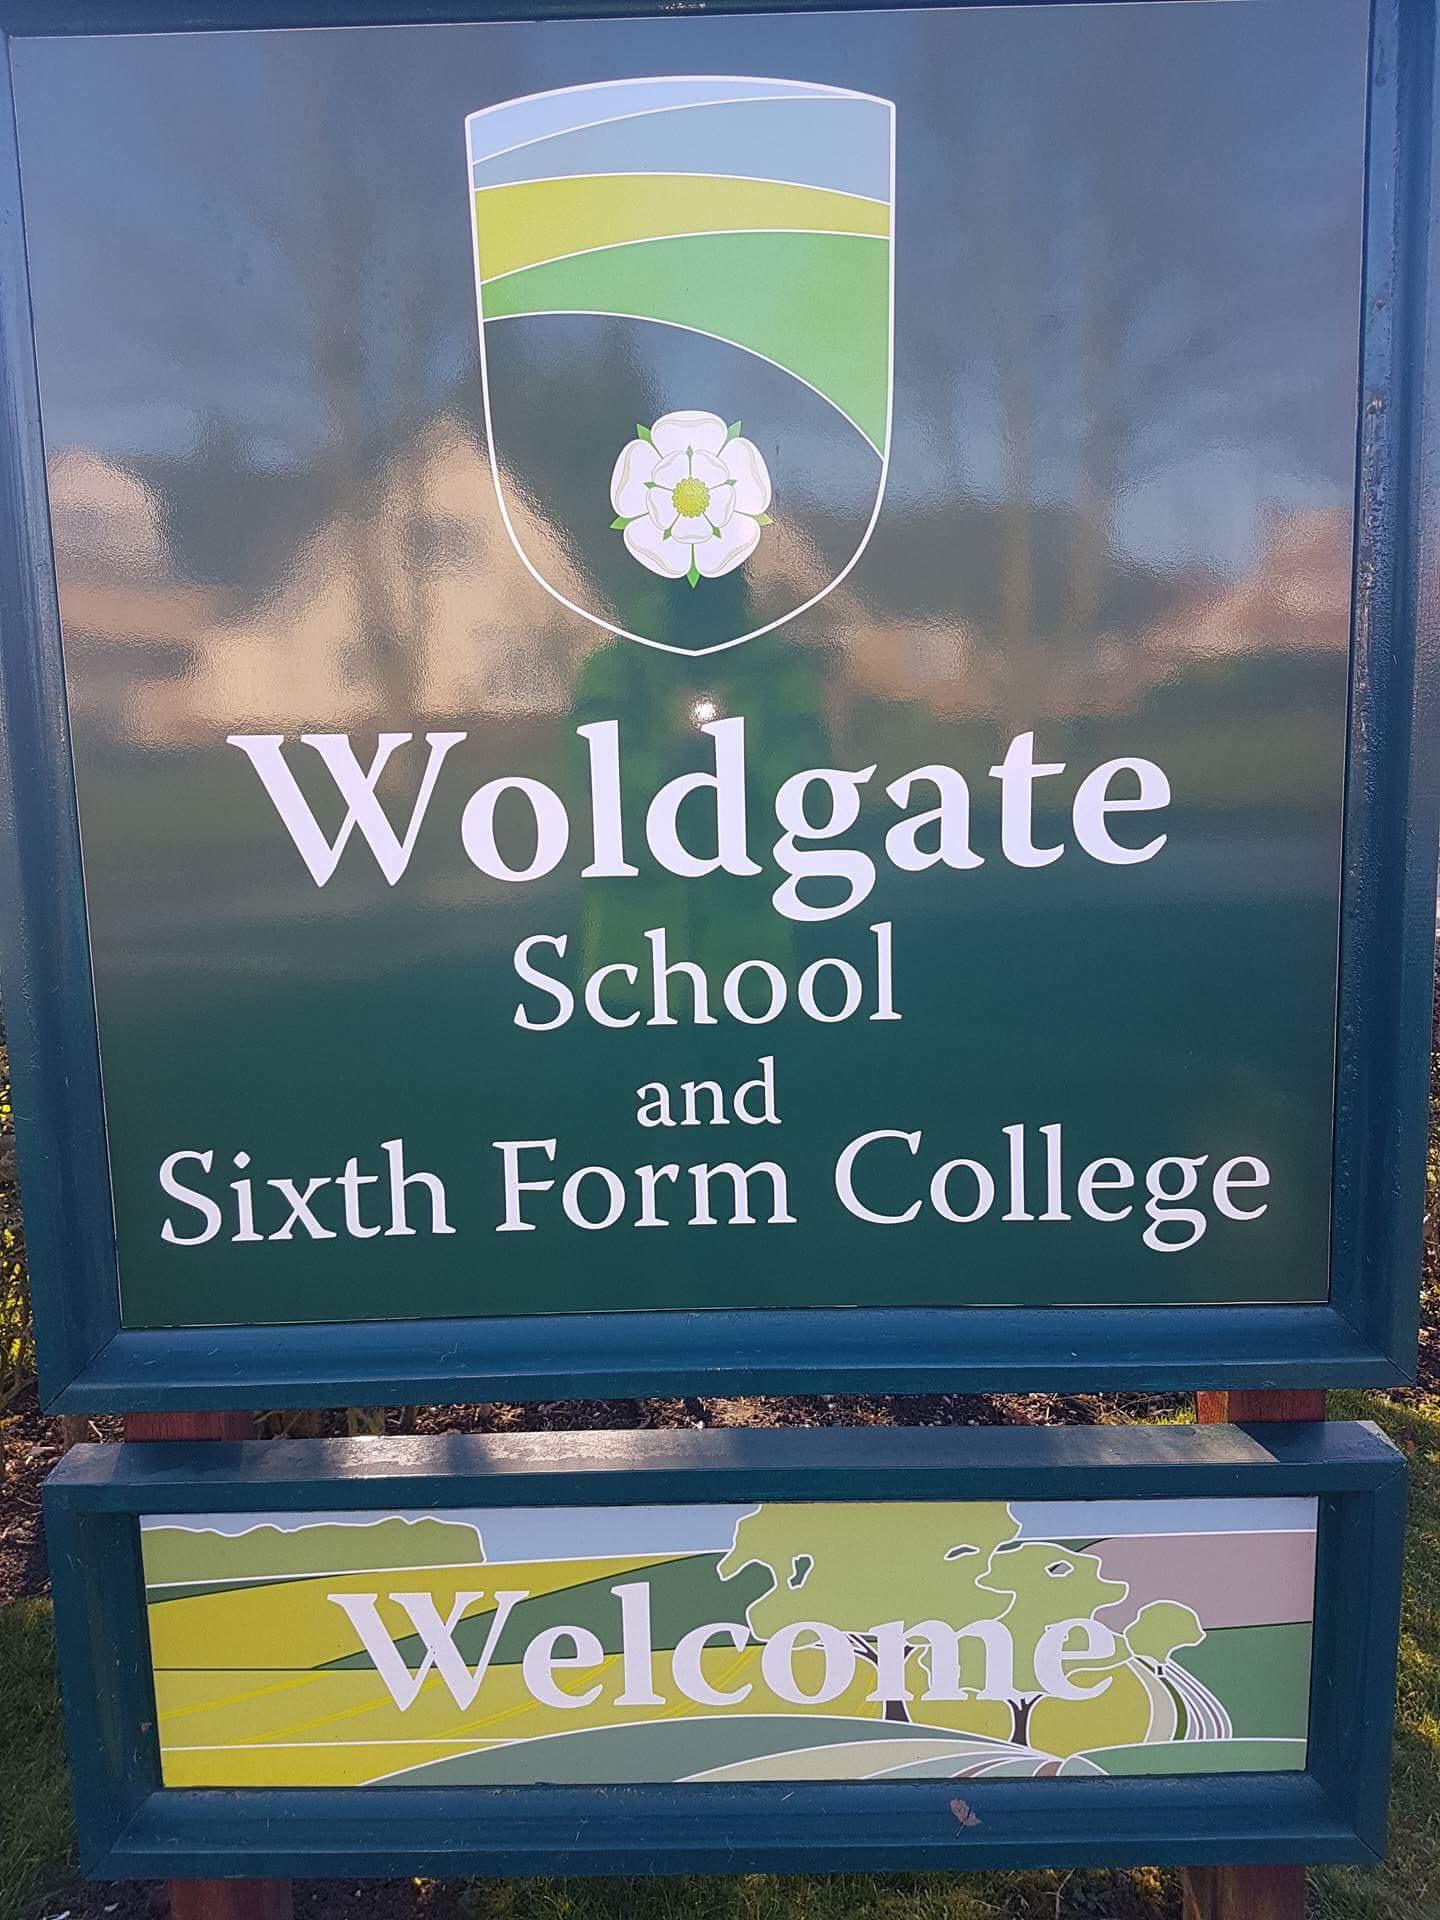 Woldgate College, York - Service 2 (HVAC) Limited